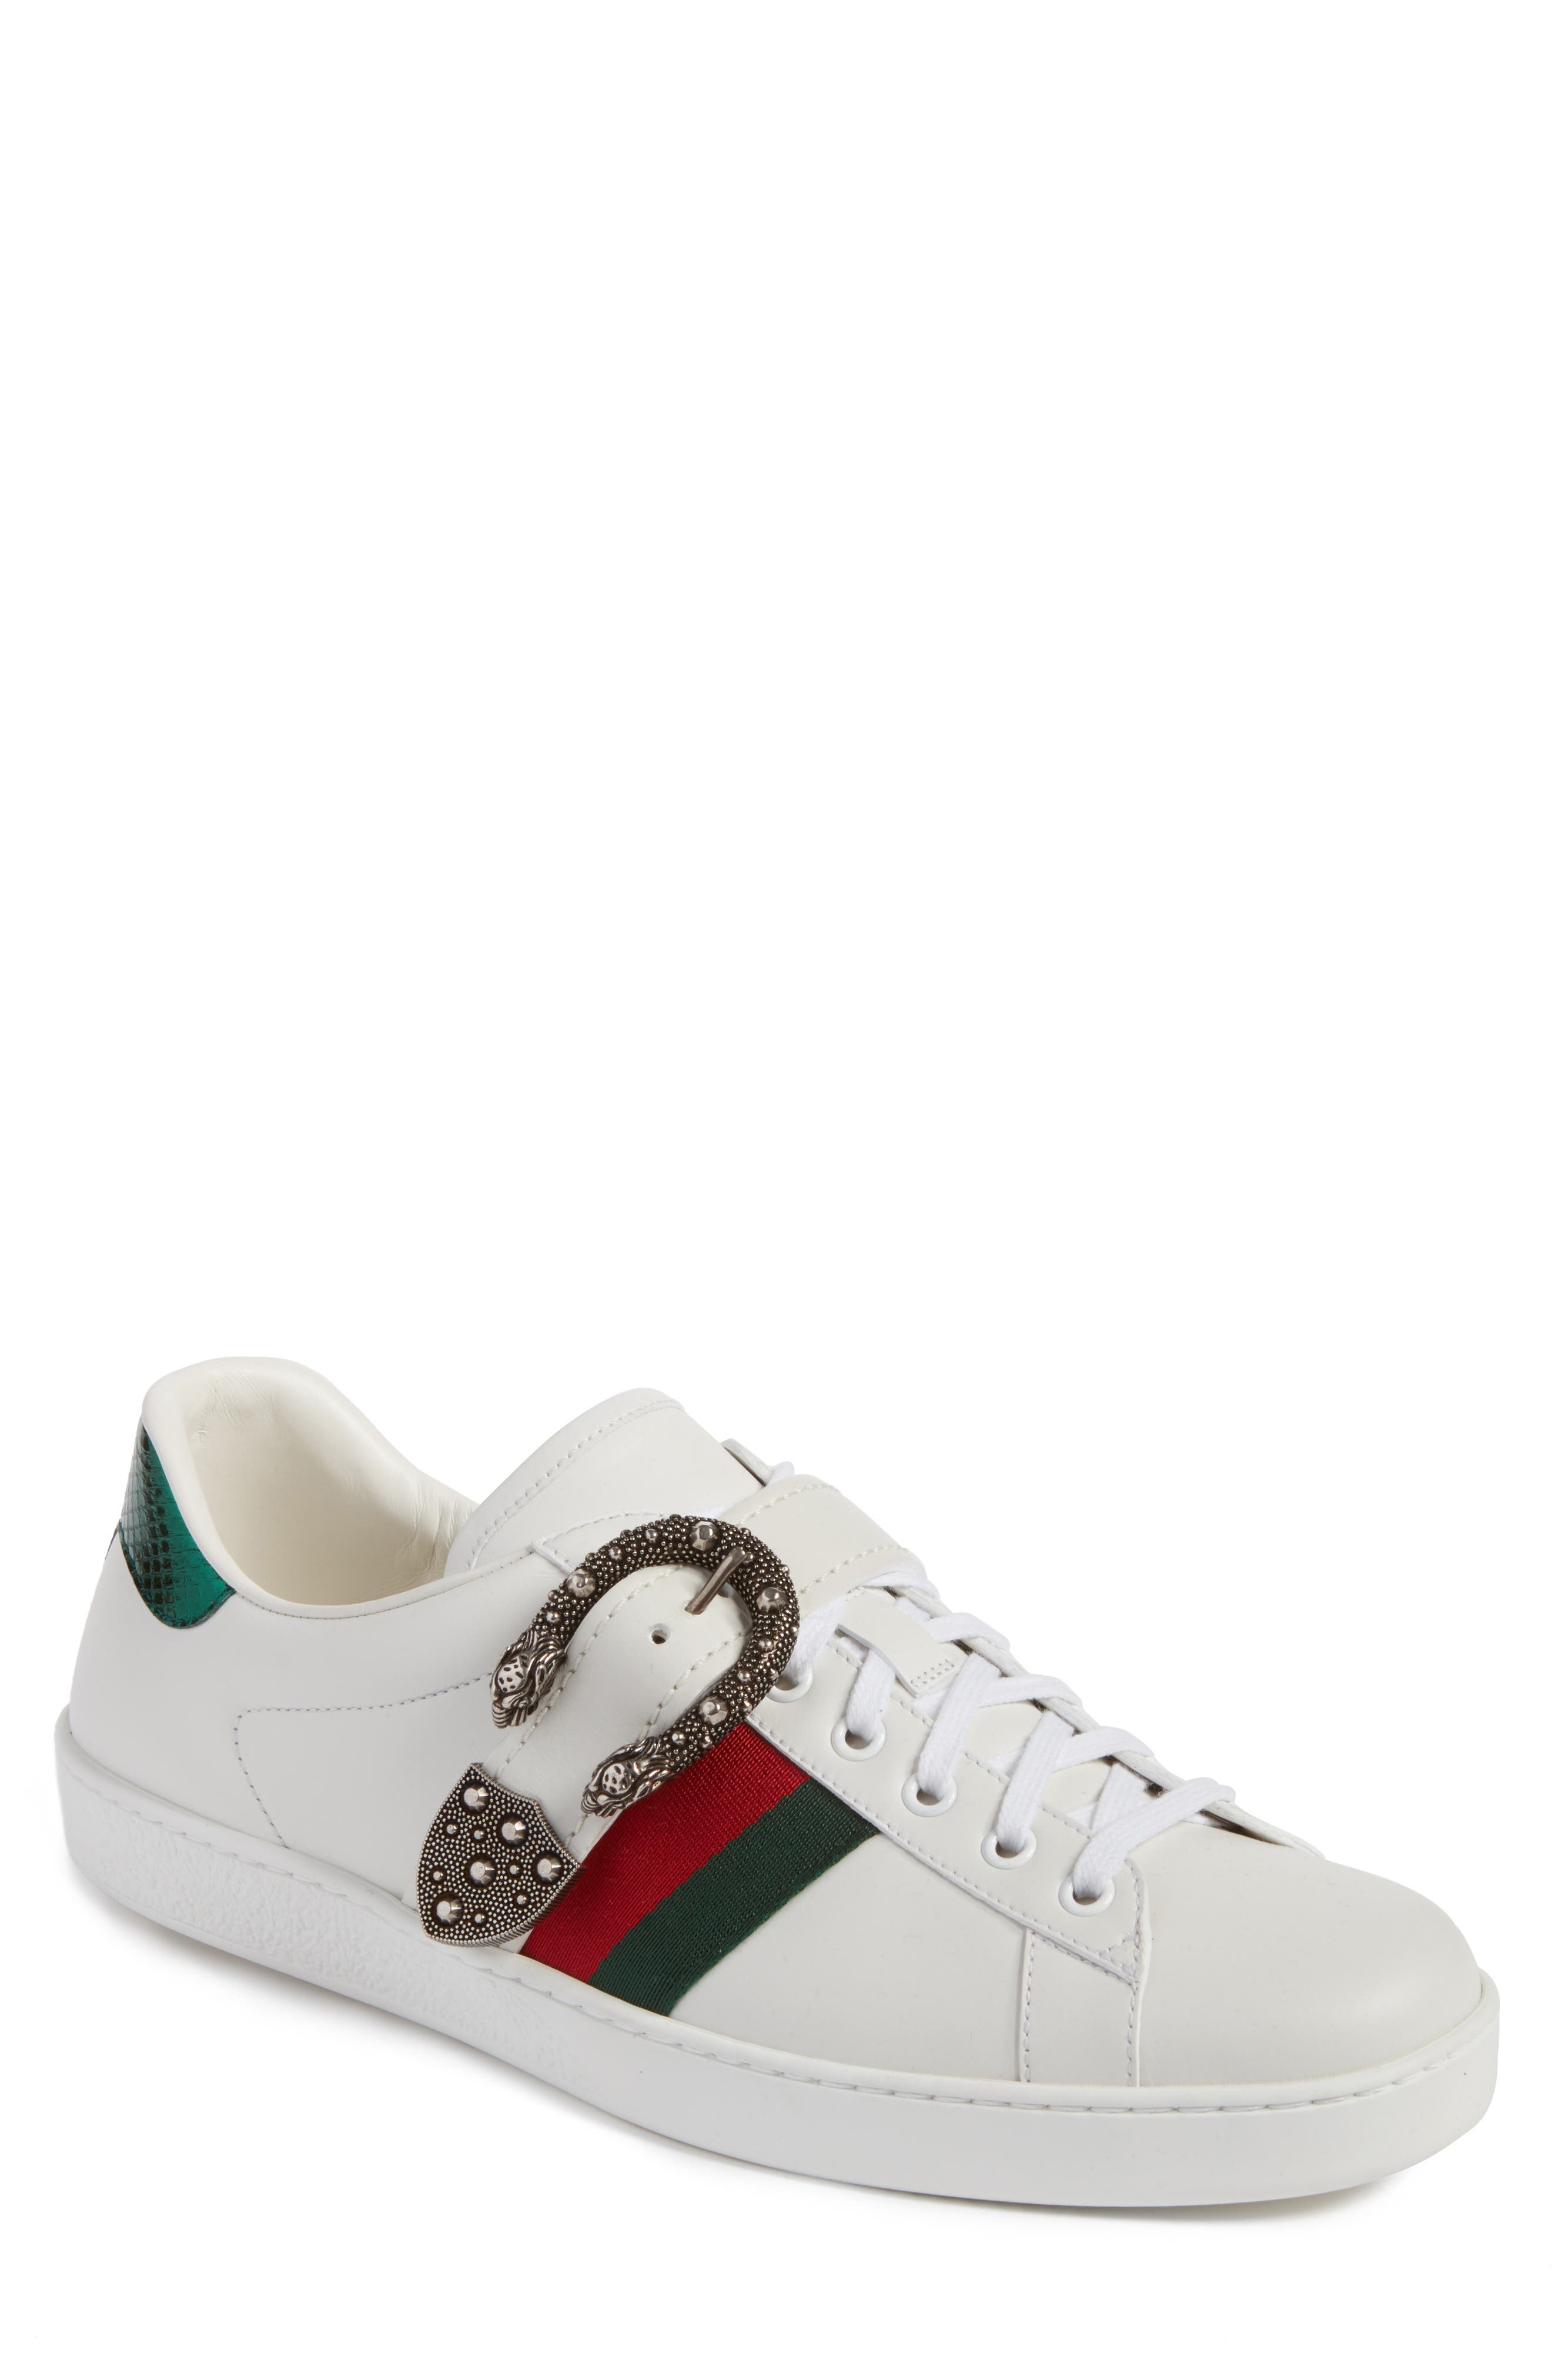 Gucci New Ace Dionysus Buckle Low Top Sneaker (Men)